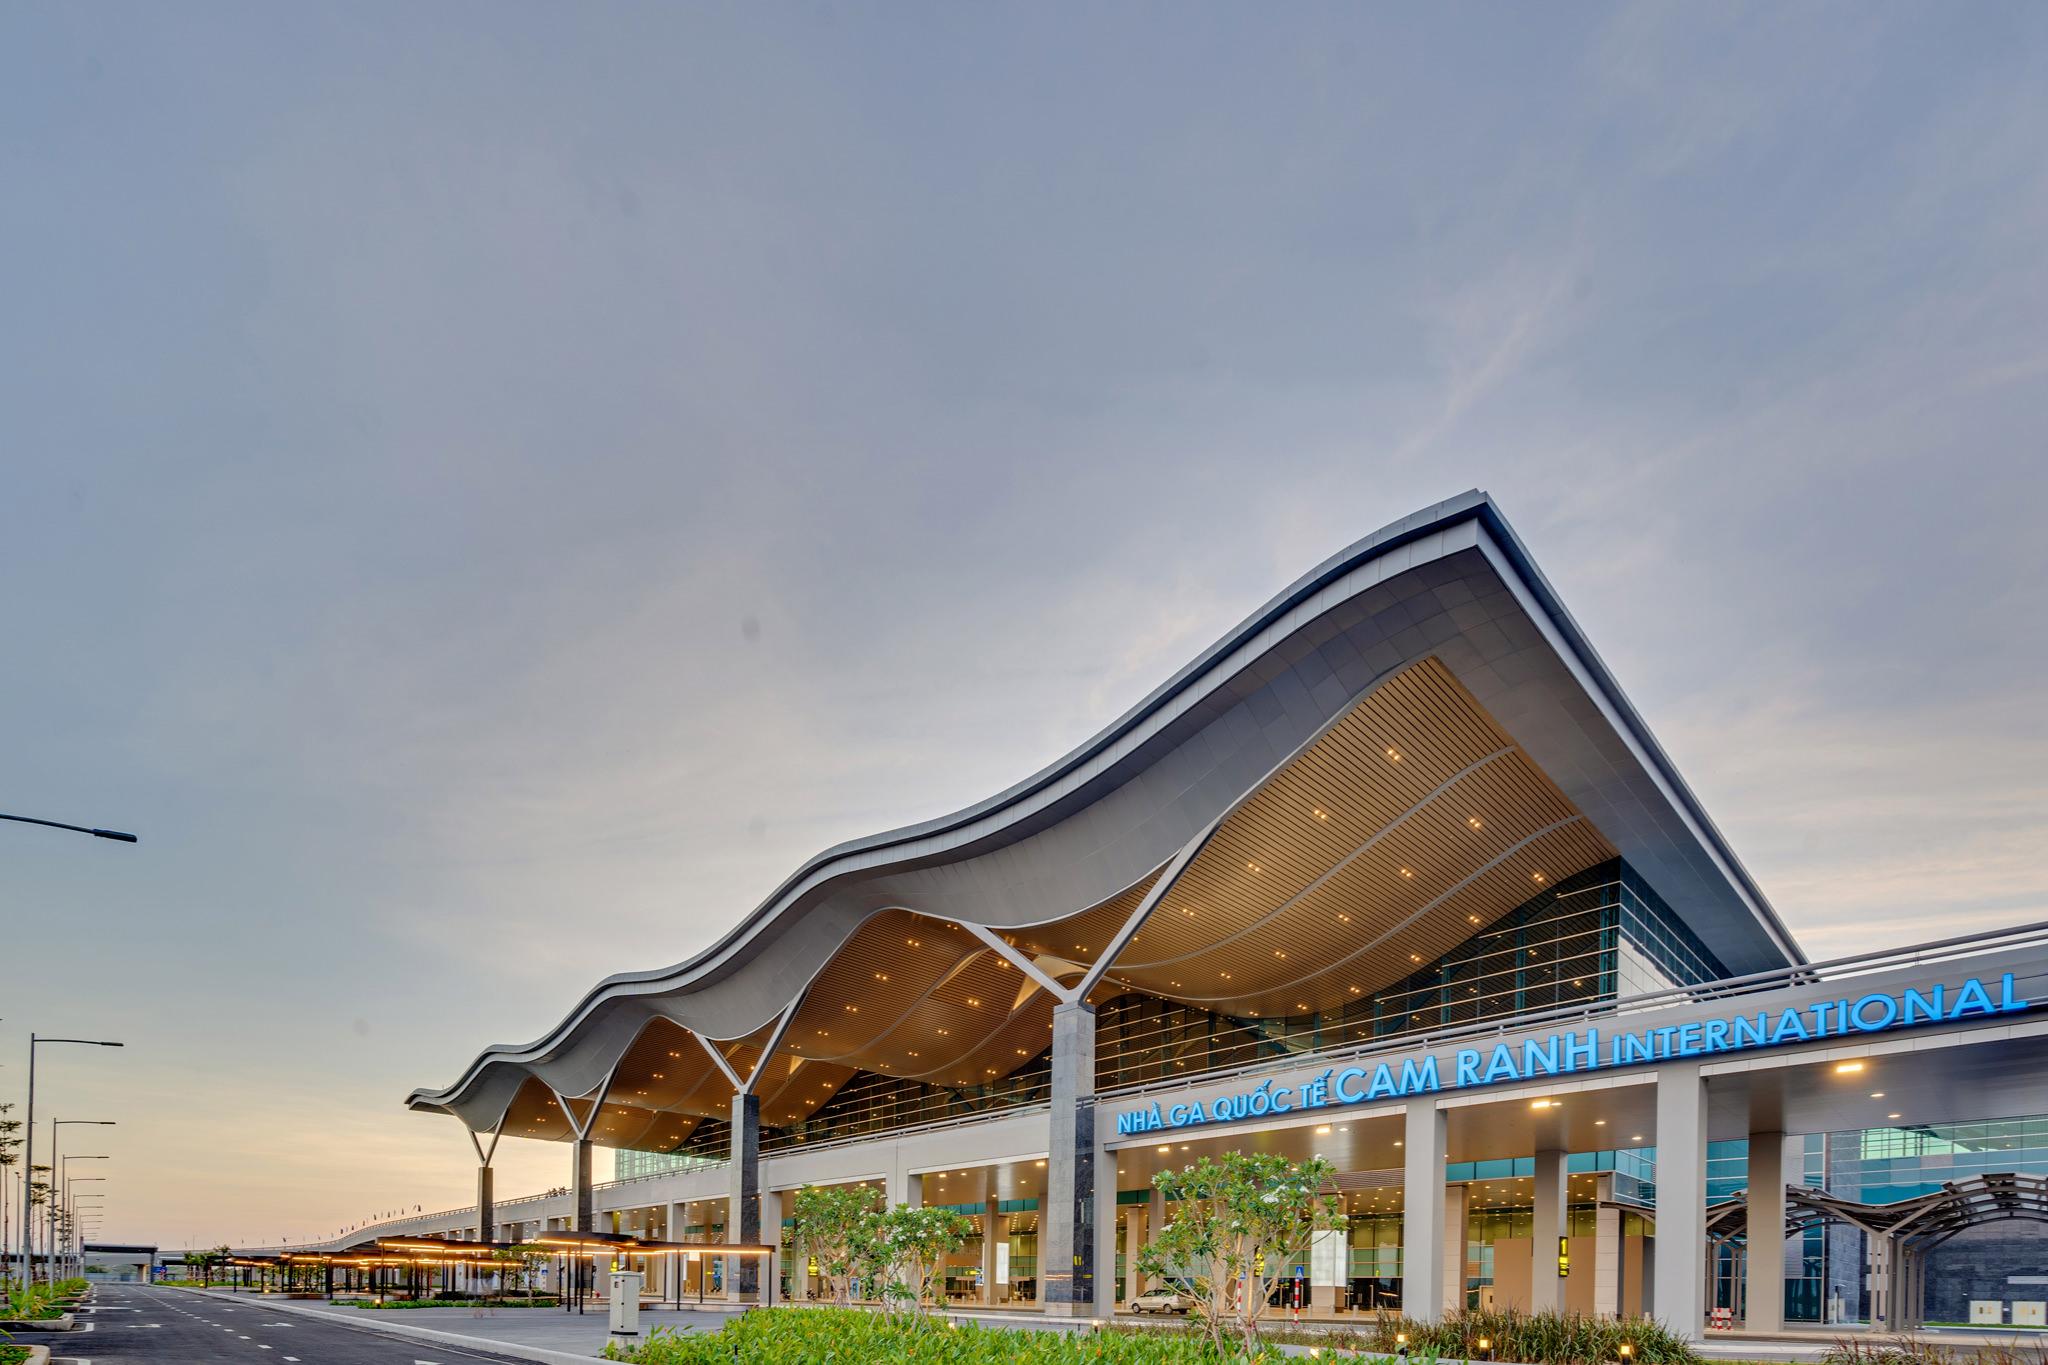 20180626 - Cam Ranh Airport - Architecture - 0011.jpg